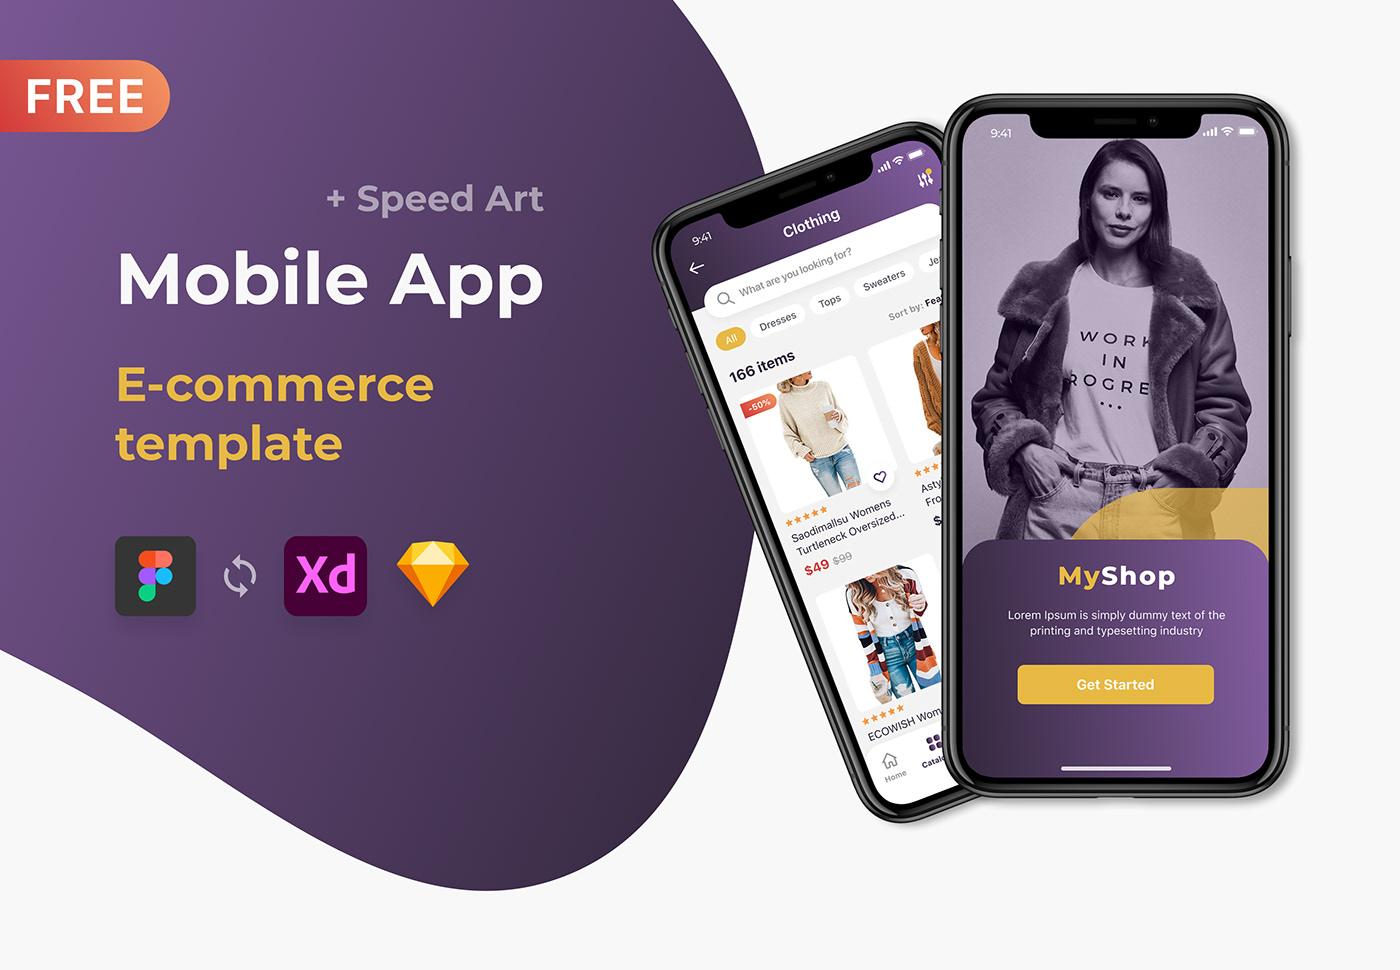 Mobile App (E-commerce template\Shop\Store) Free download